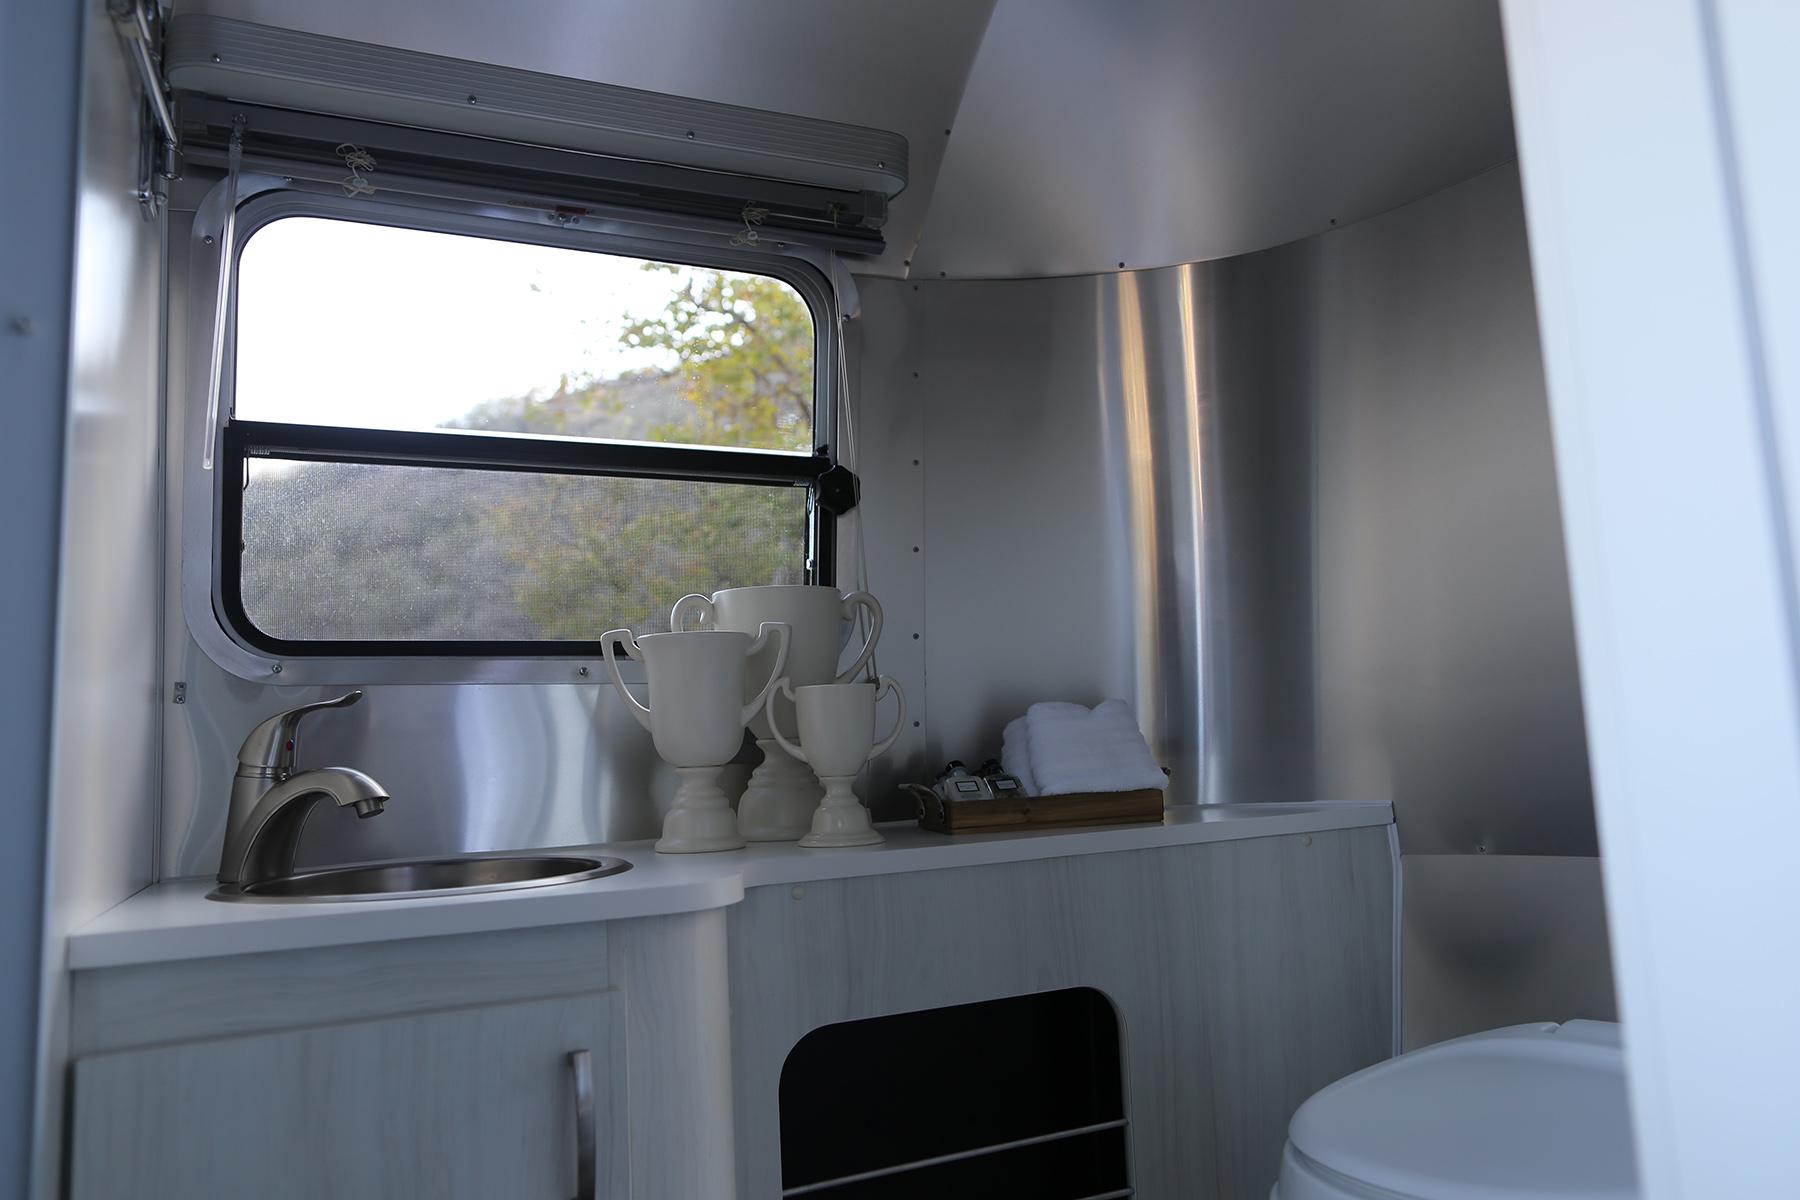 airstream-rental-bambi-sport-22ft-bathroom.JPG